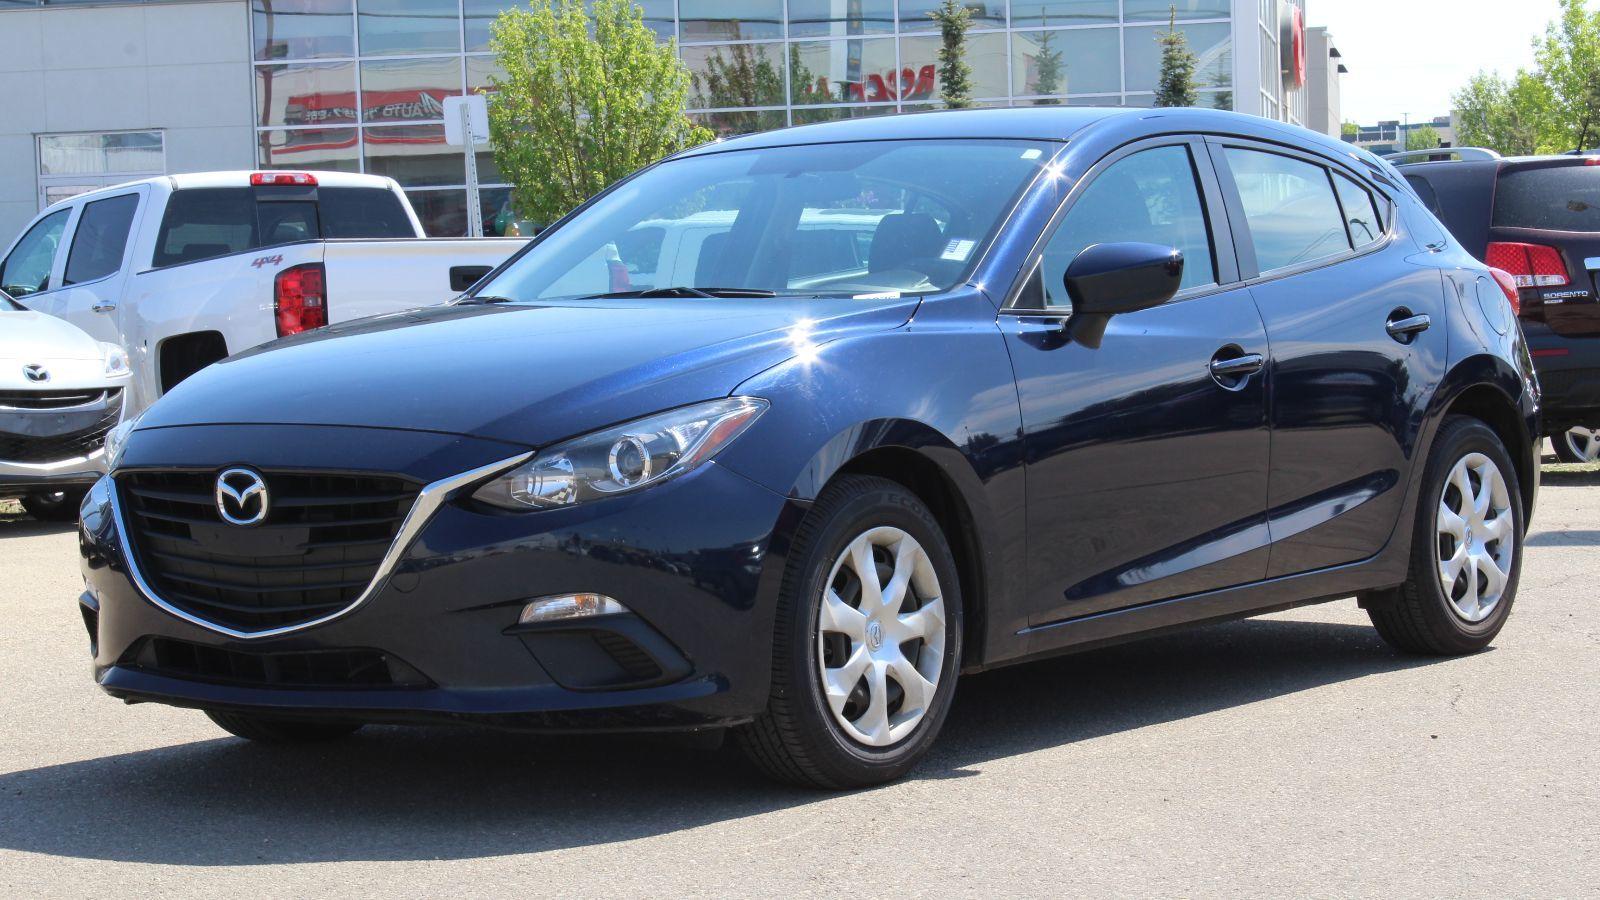 Sundance Mazda Sales >> Used 2015 Mazda Mazda3 at Sundance Mazda Edmonton | 15500.0$